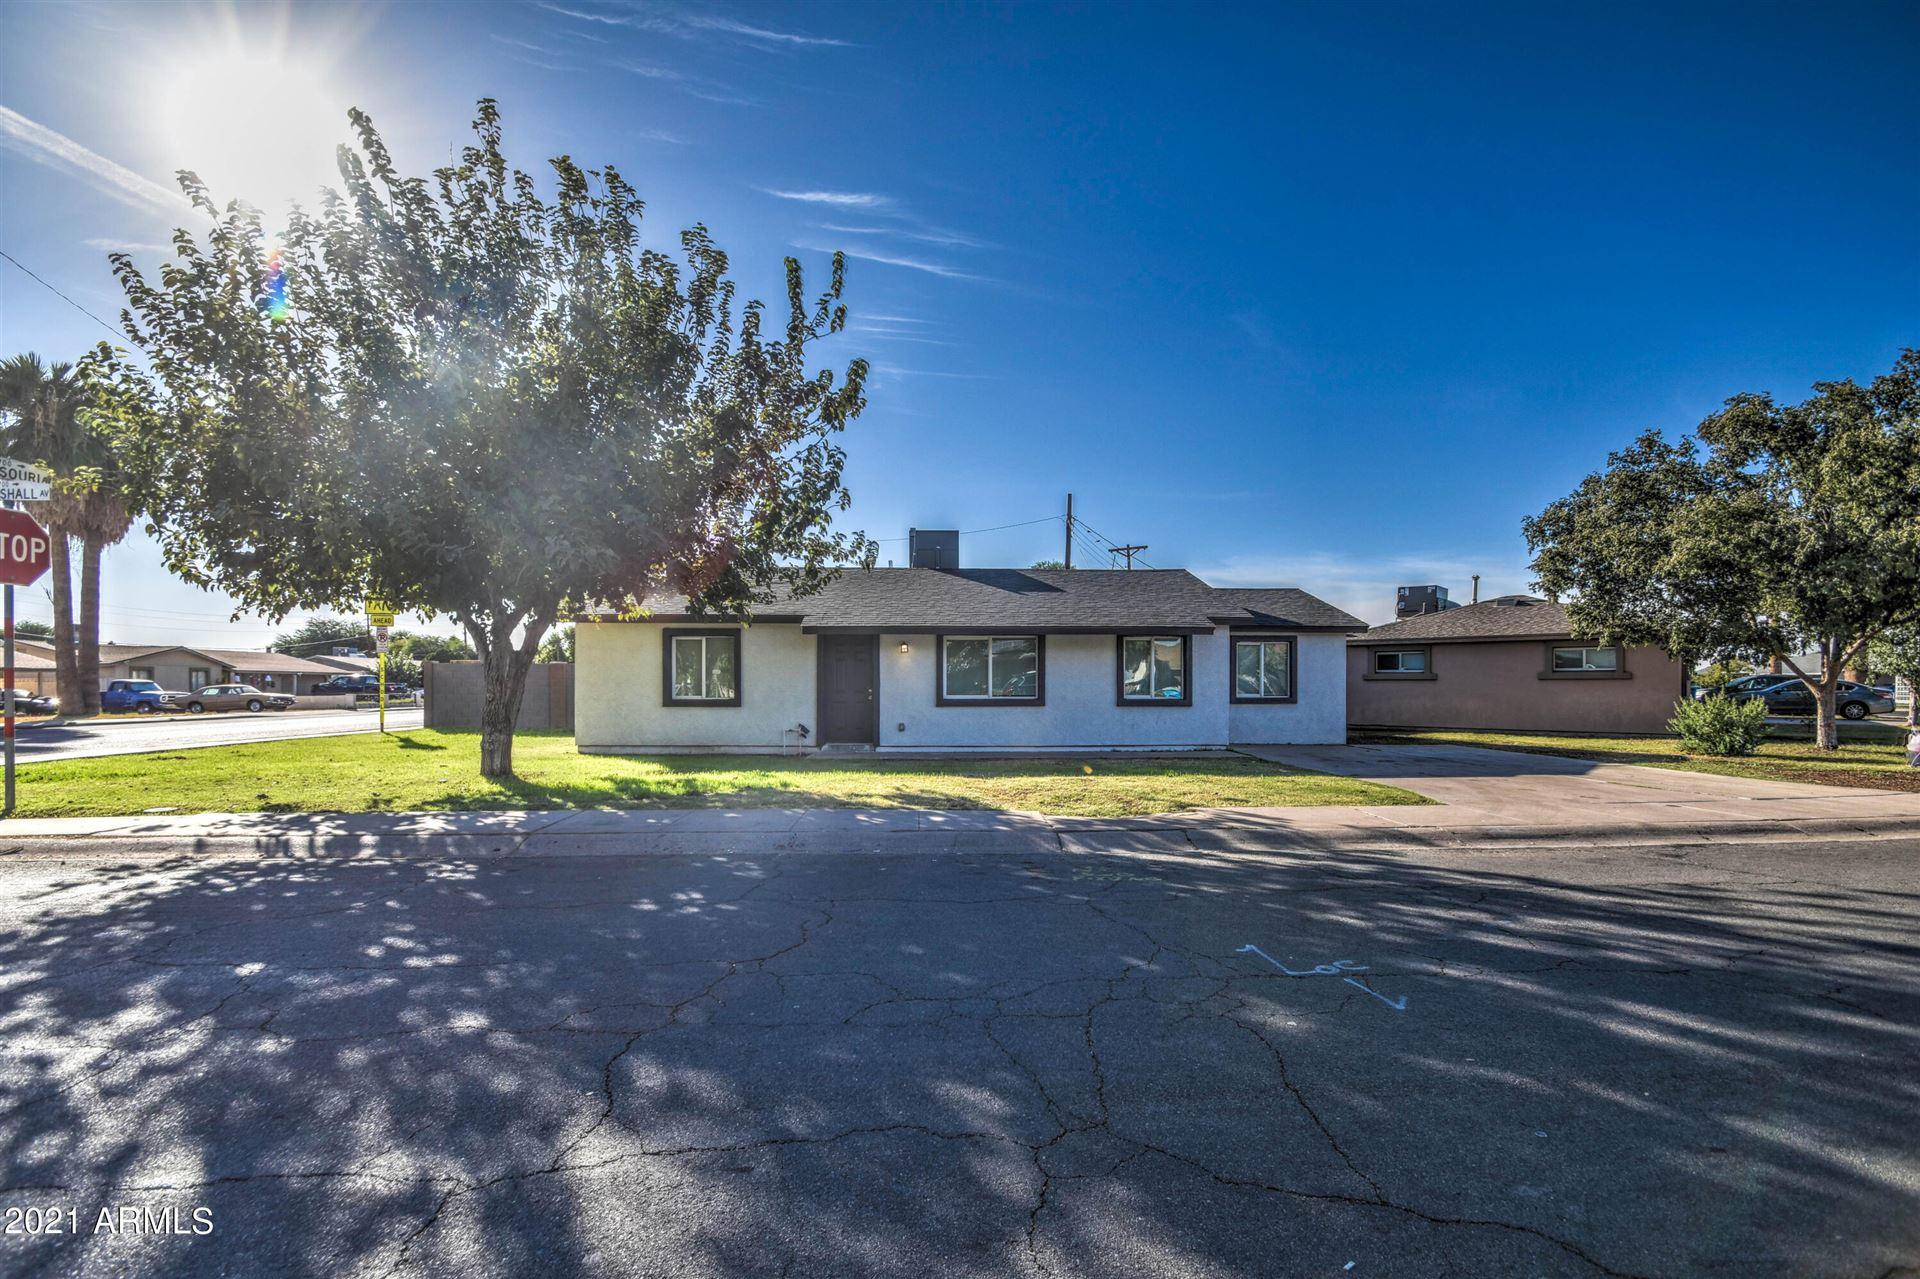 3709 W MARSHALL Avenue, Phoenix, AZ 85019 - MLS#: 6275919